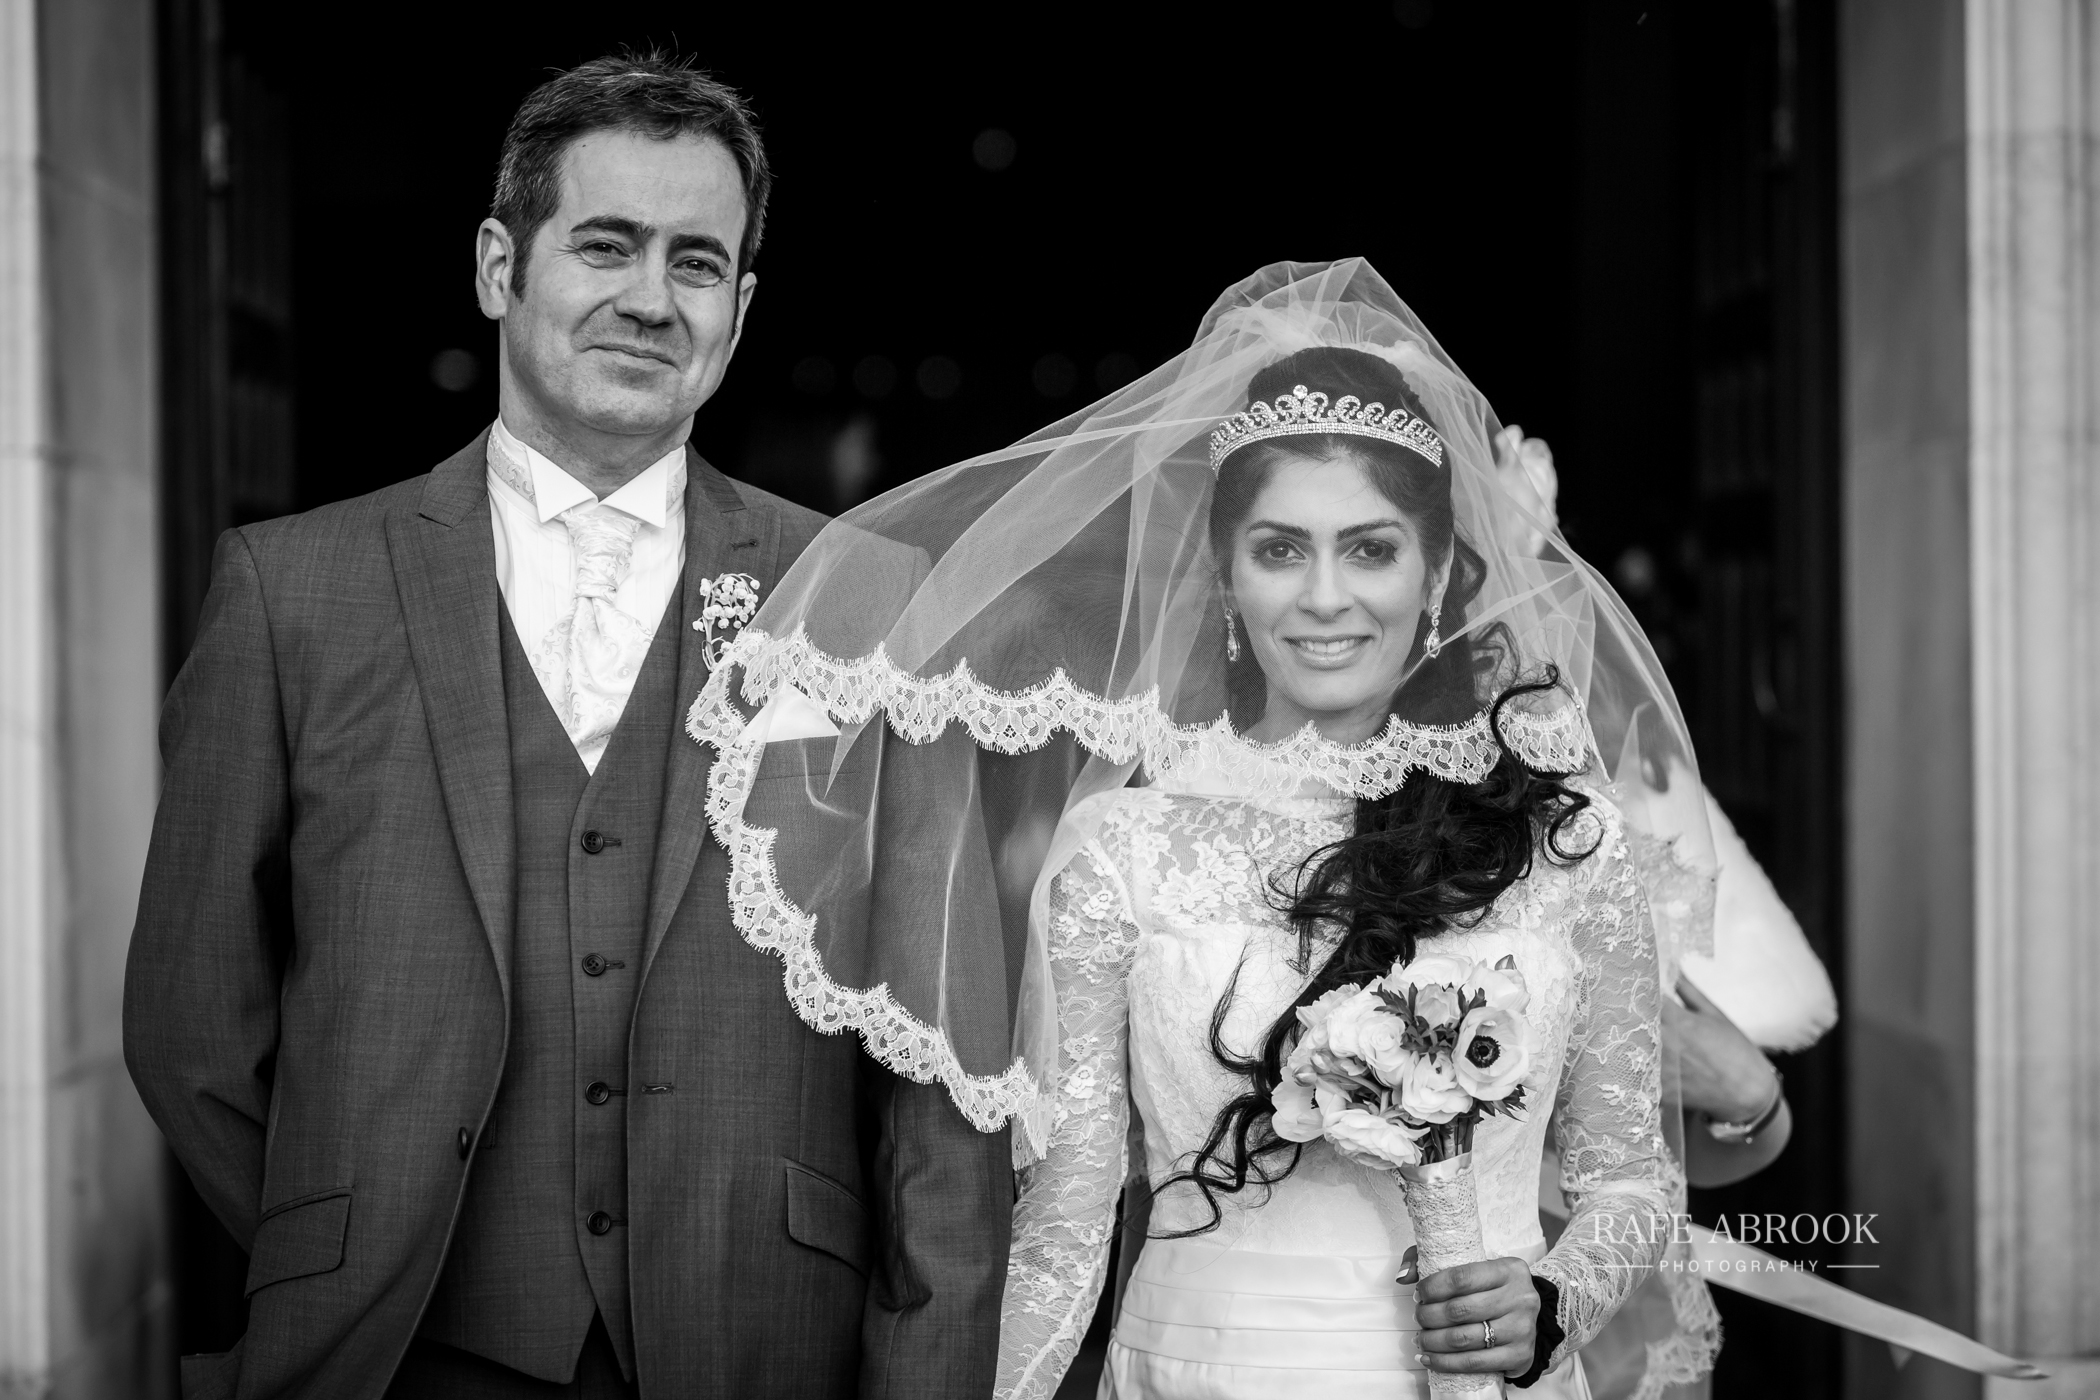 roma & pete wedding hampstead shenley hertfordshire -247.jpg